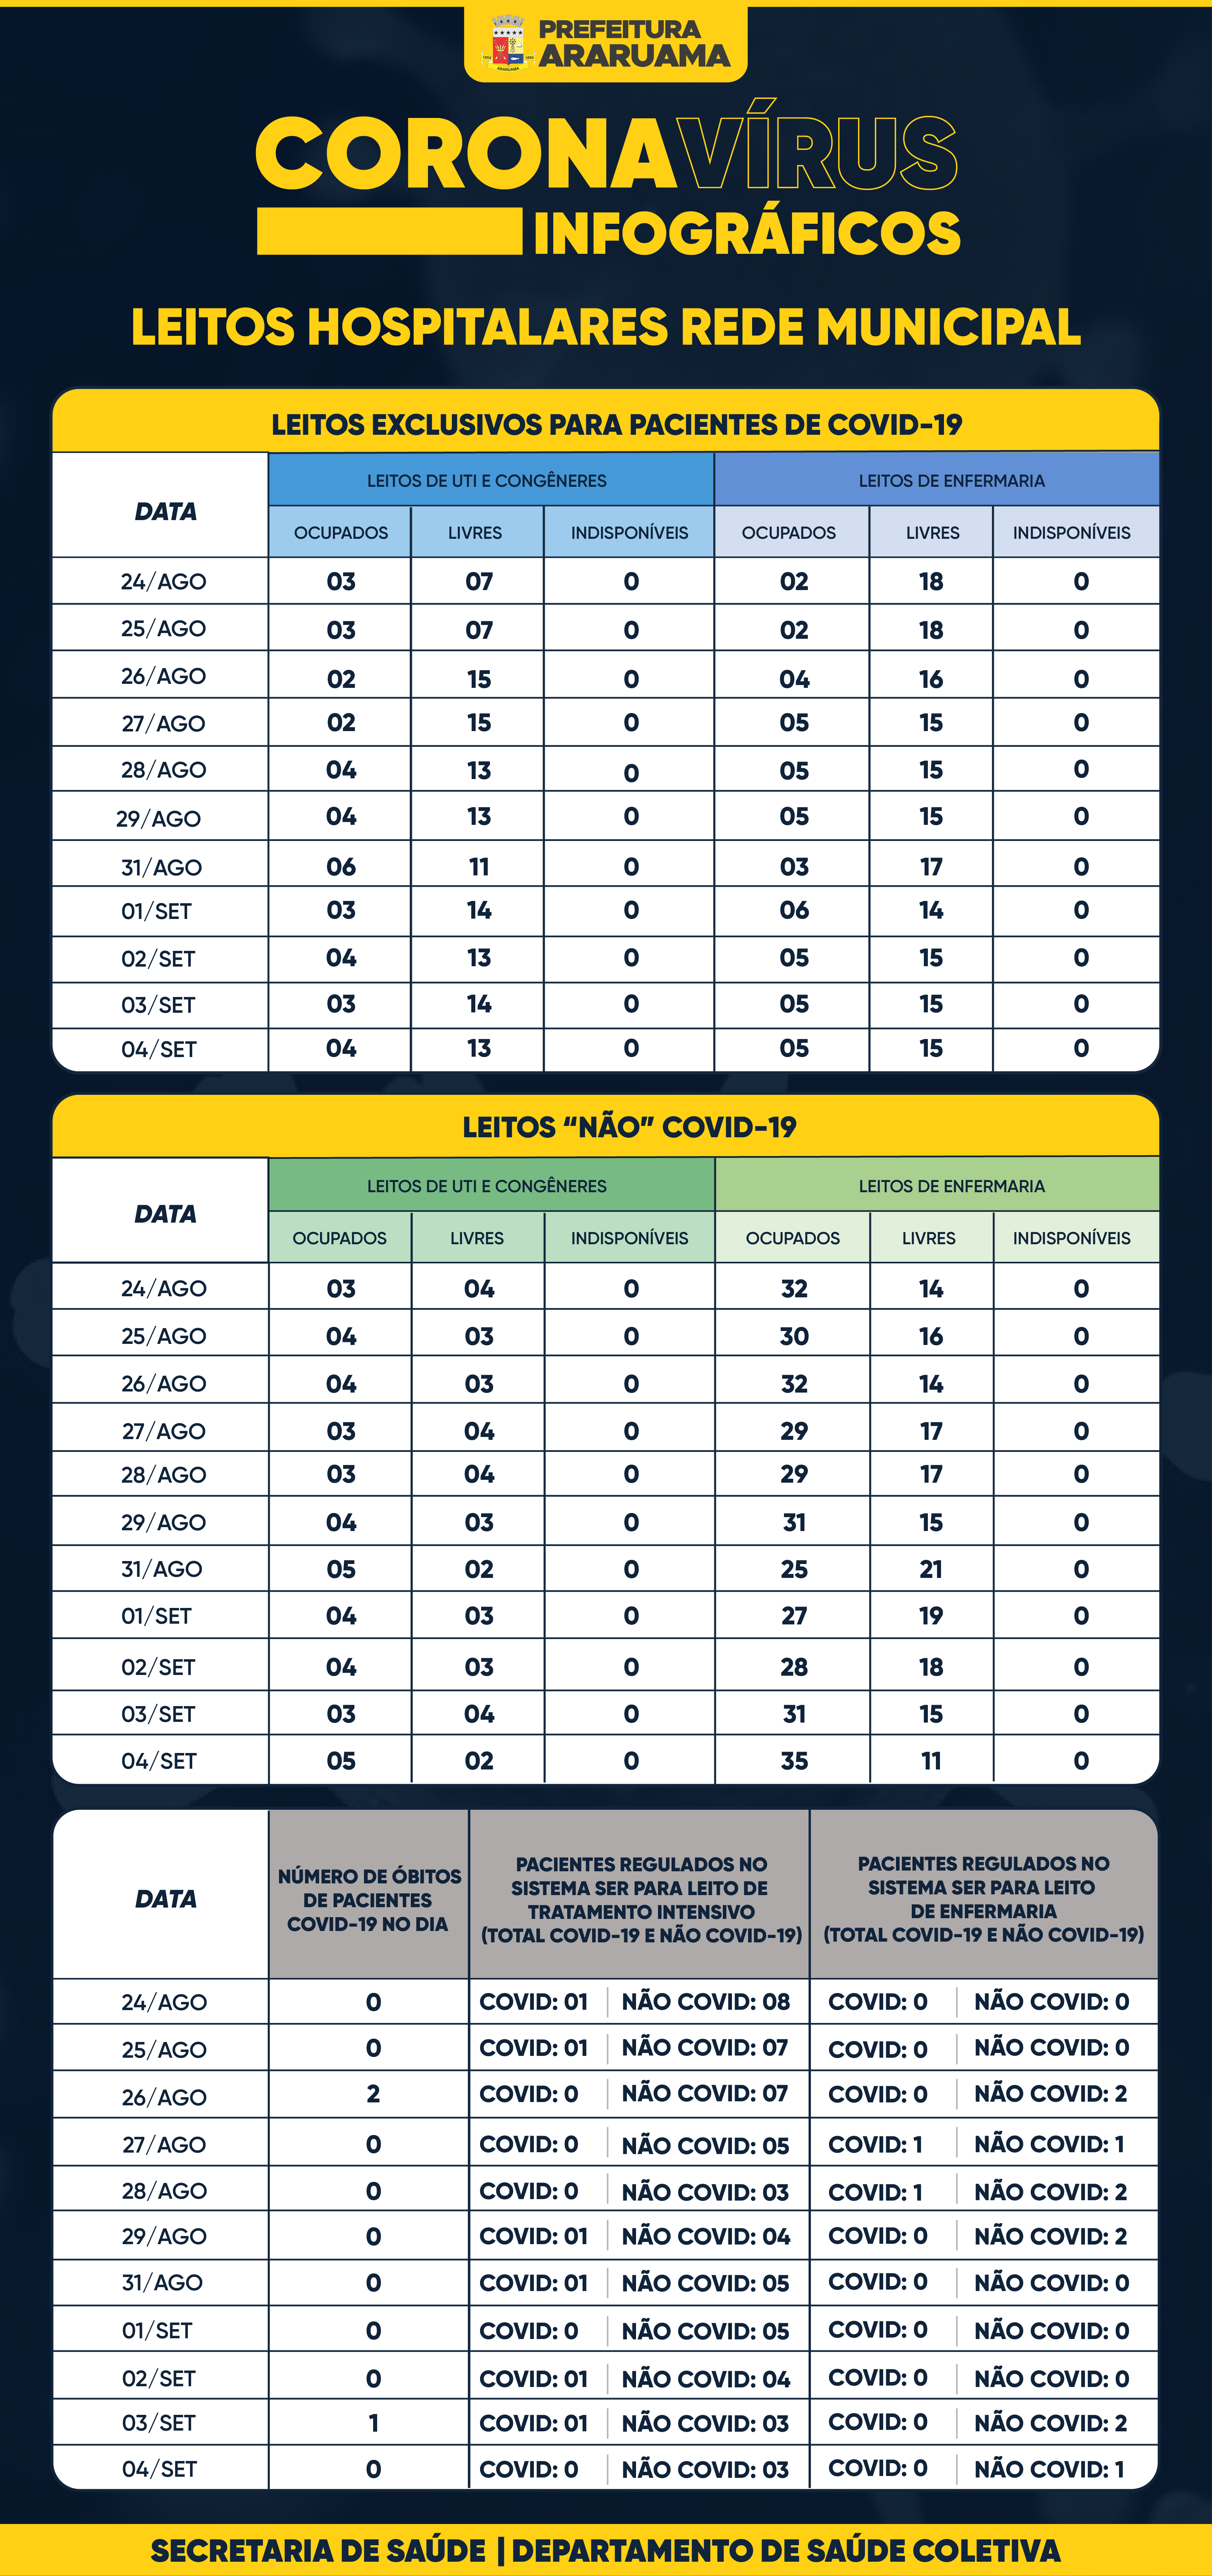 Painel de Monitoramento de Leitos COVID-19 — 04 de setembro de 2020